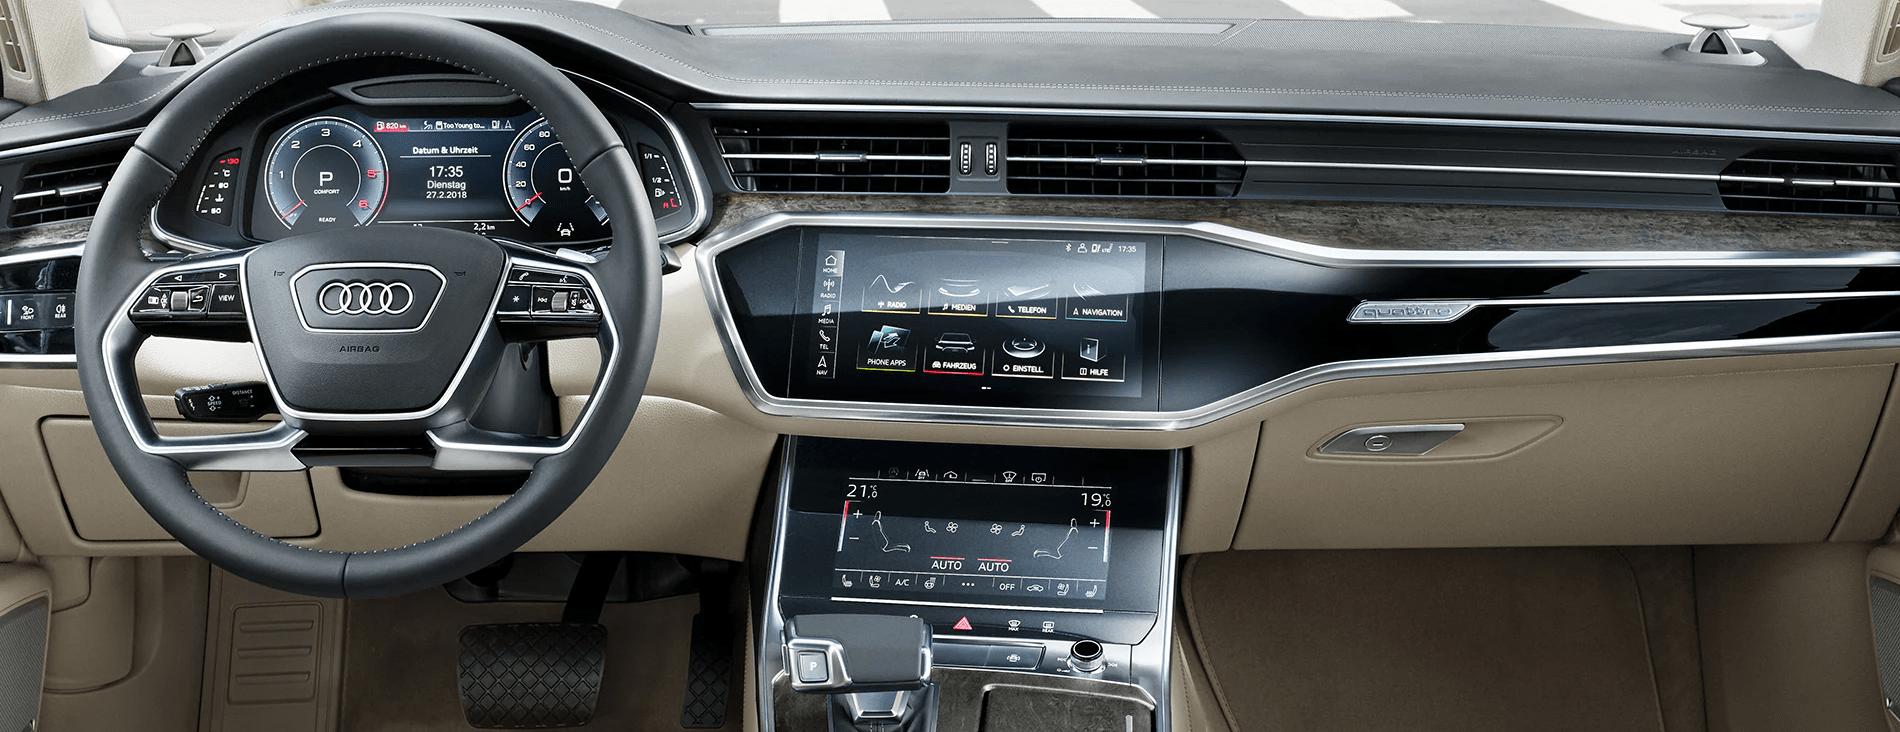 Pusat Audi yedek parça